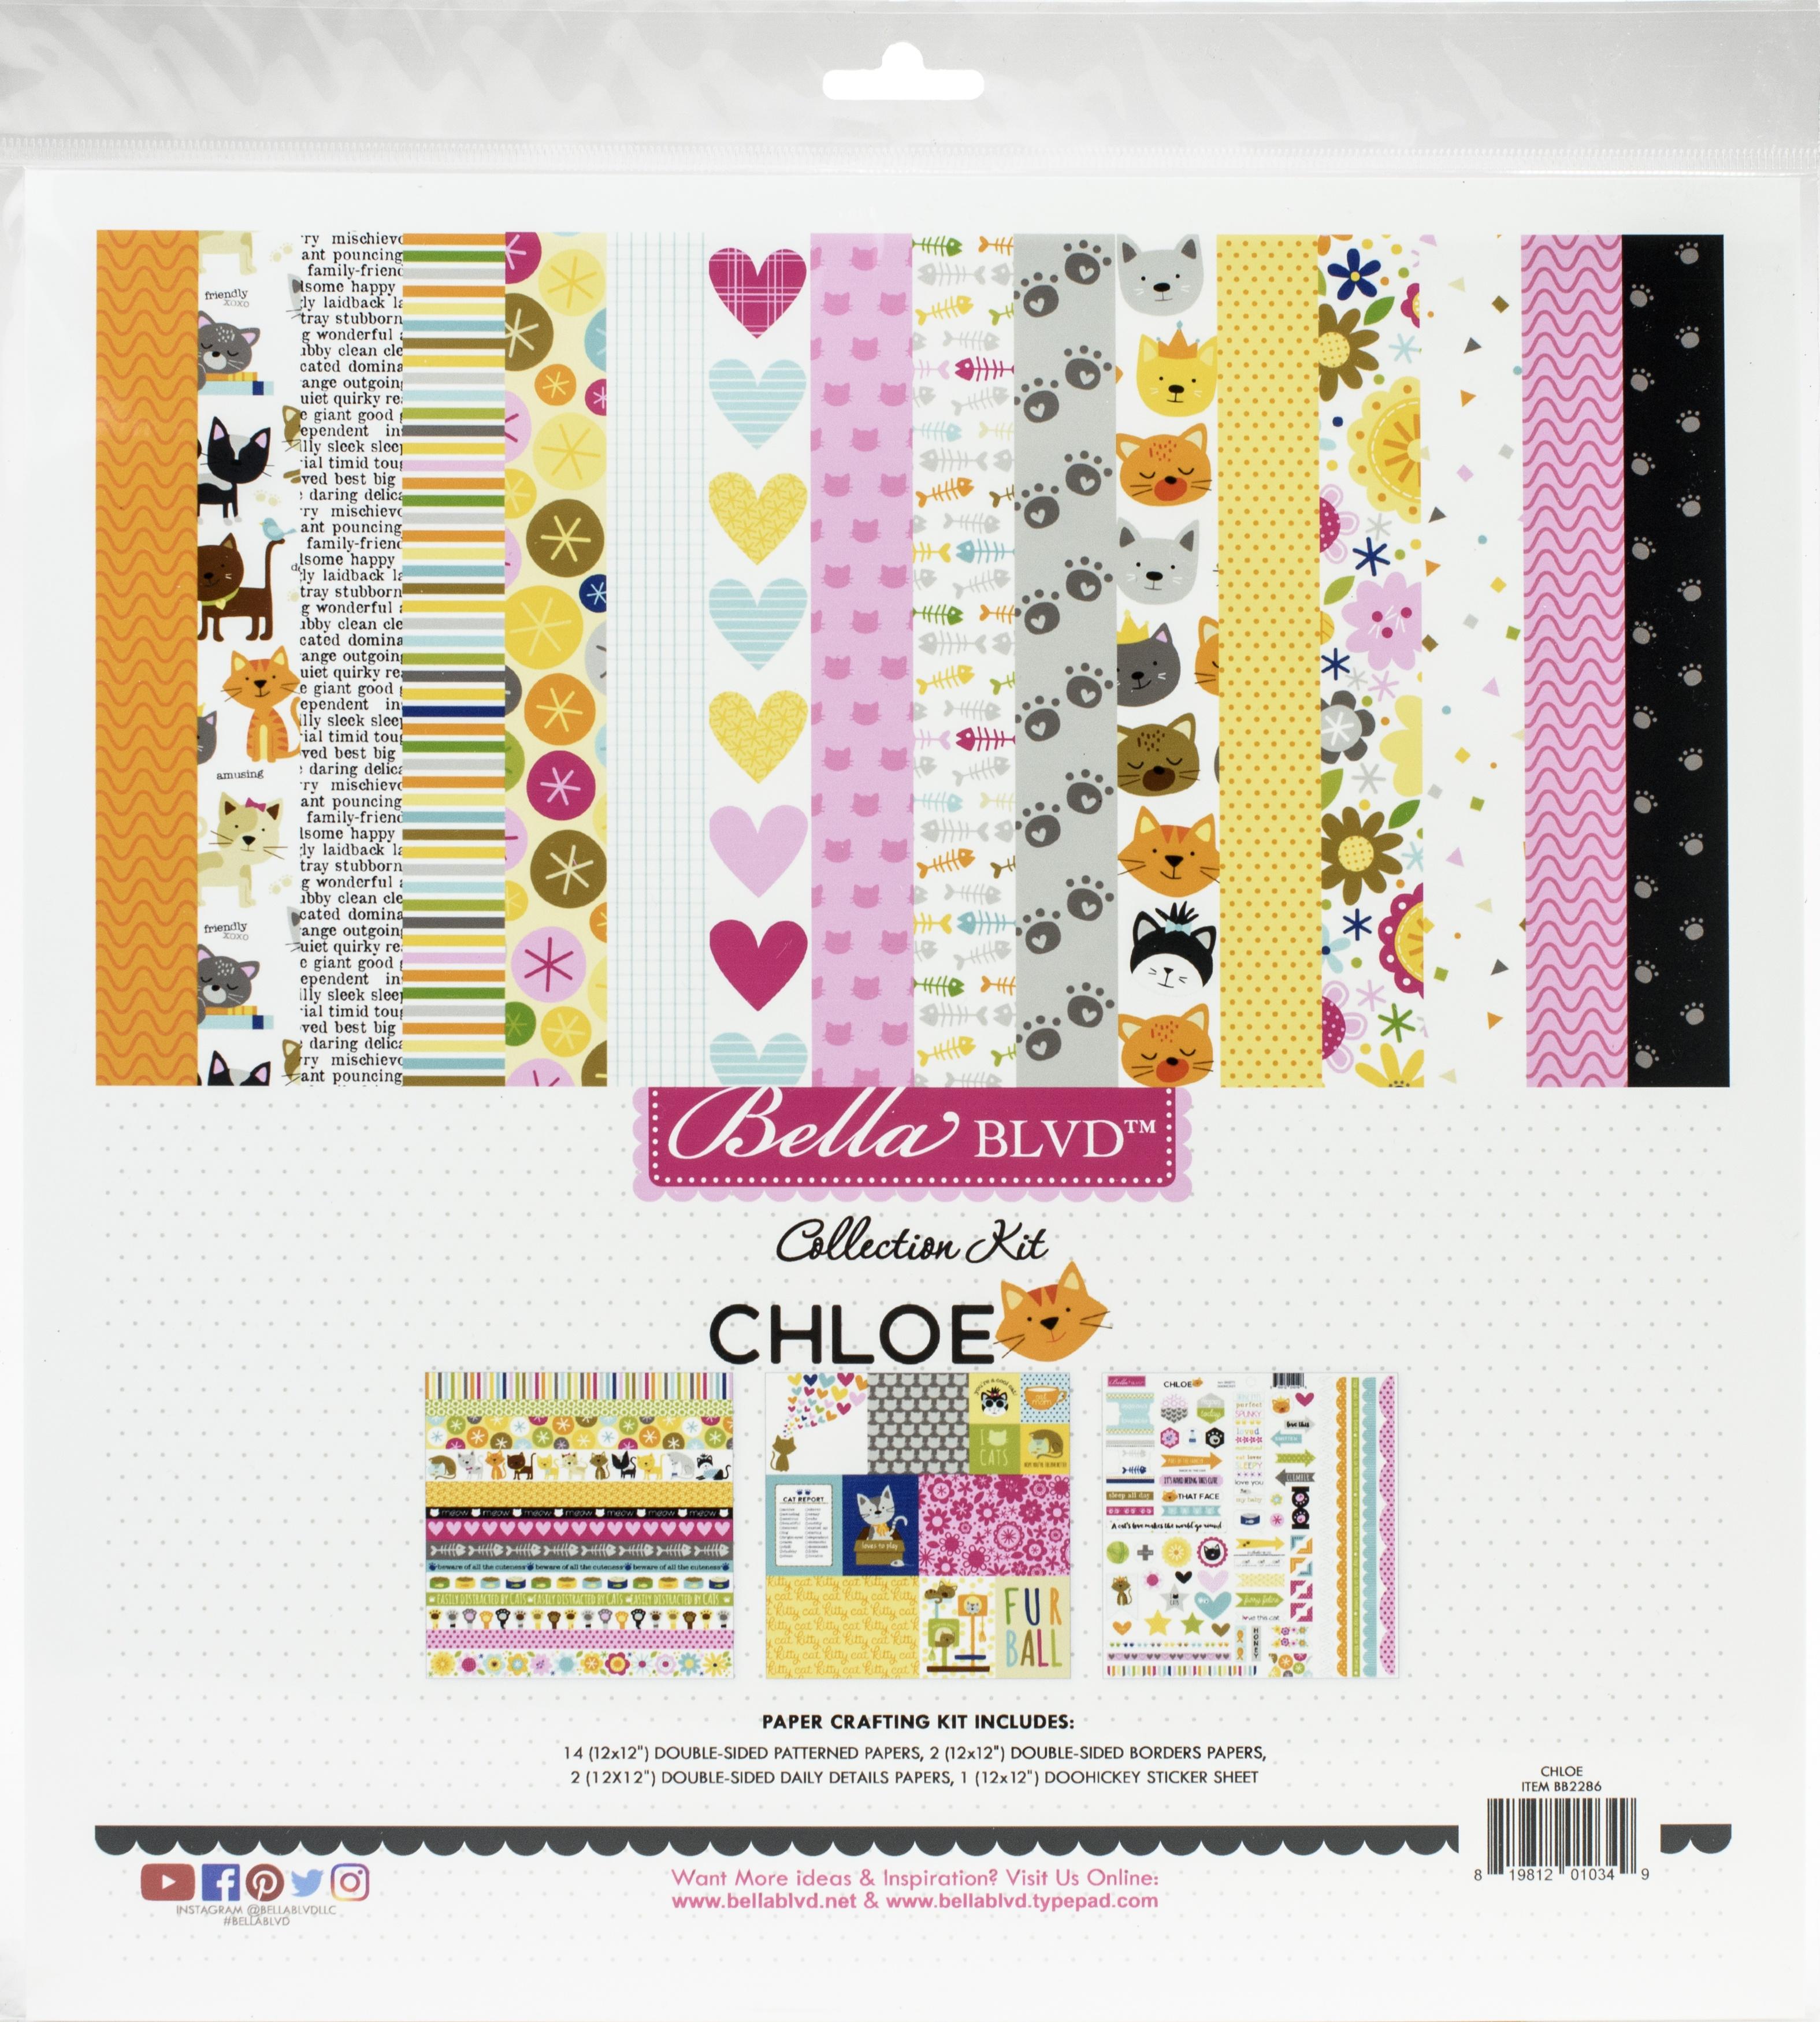 Bella Blvd Collection Kit 12X12-Chloe